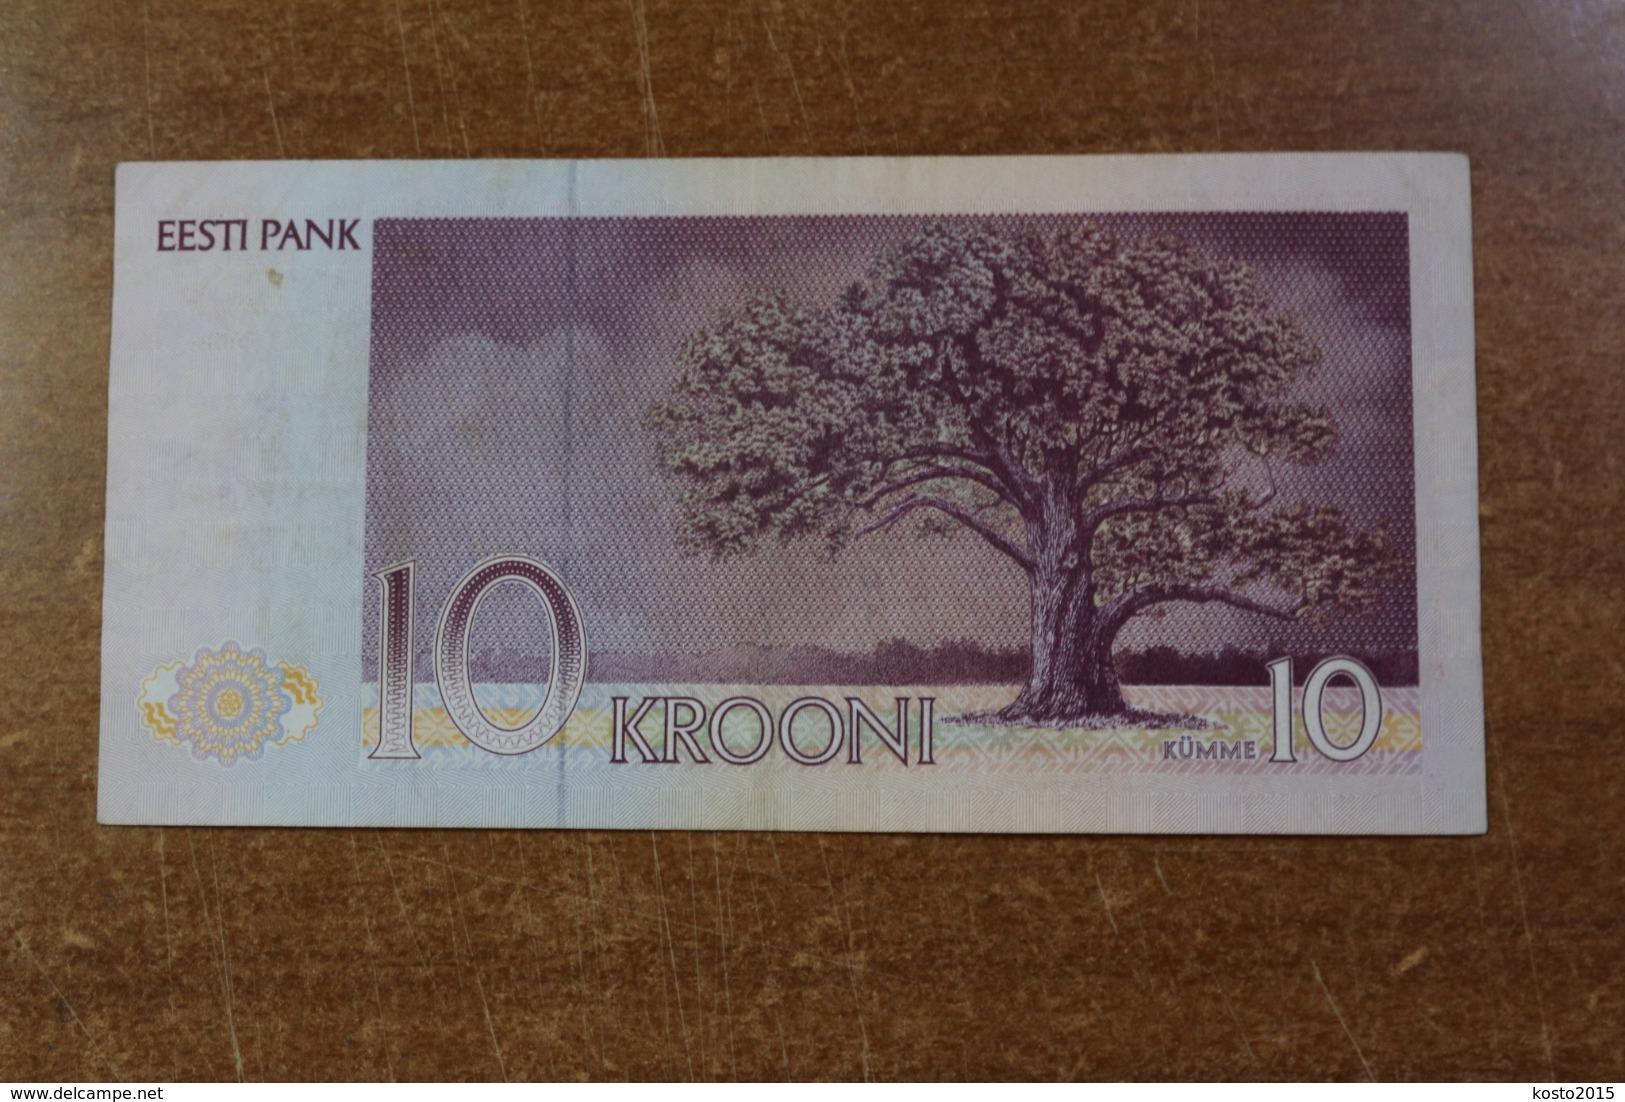 Estonia 10 Kroons 1991 UNC - Estland